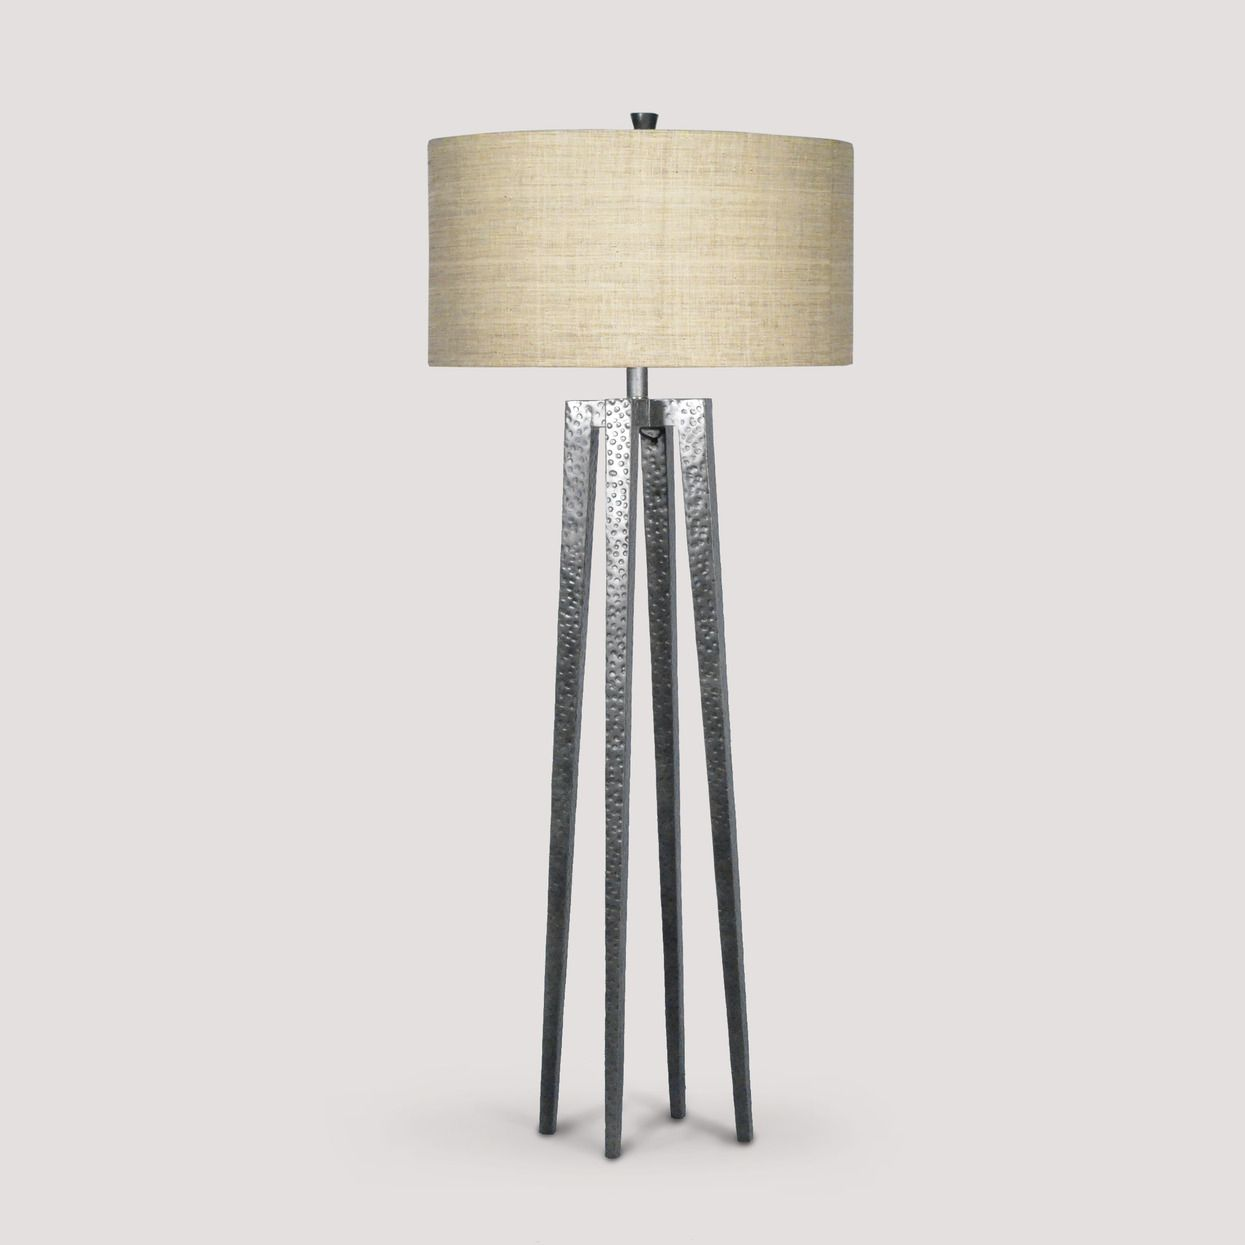 palecek lighting. Josephine Quattro Floor Lamp 256442 Palecek Lighting S